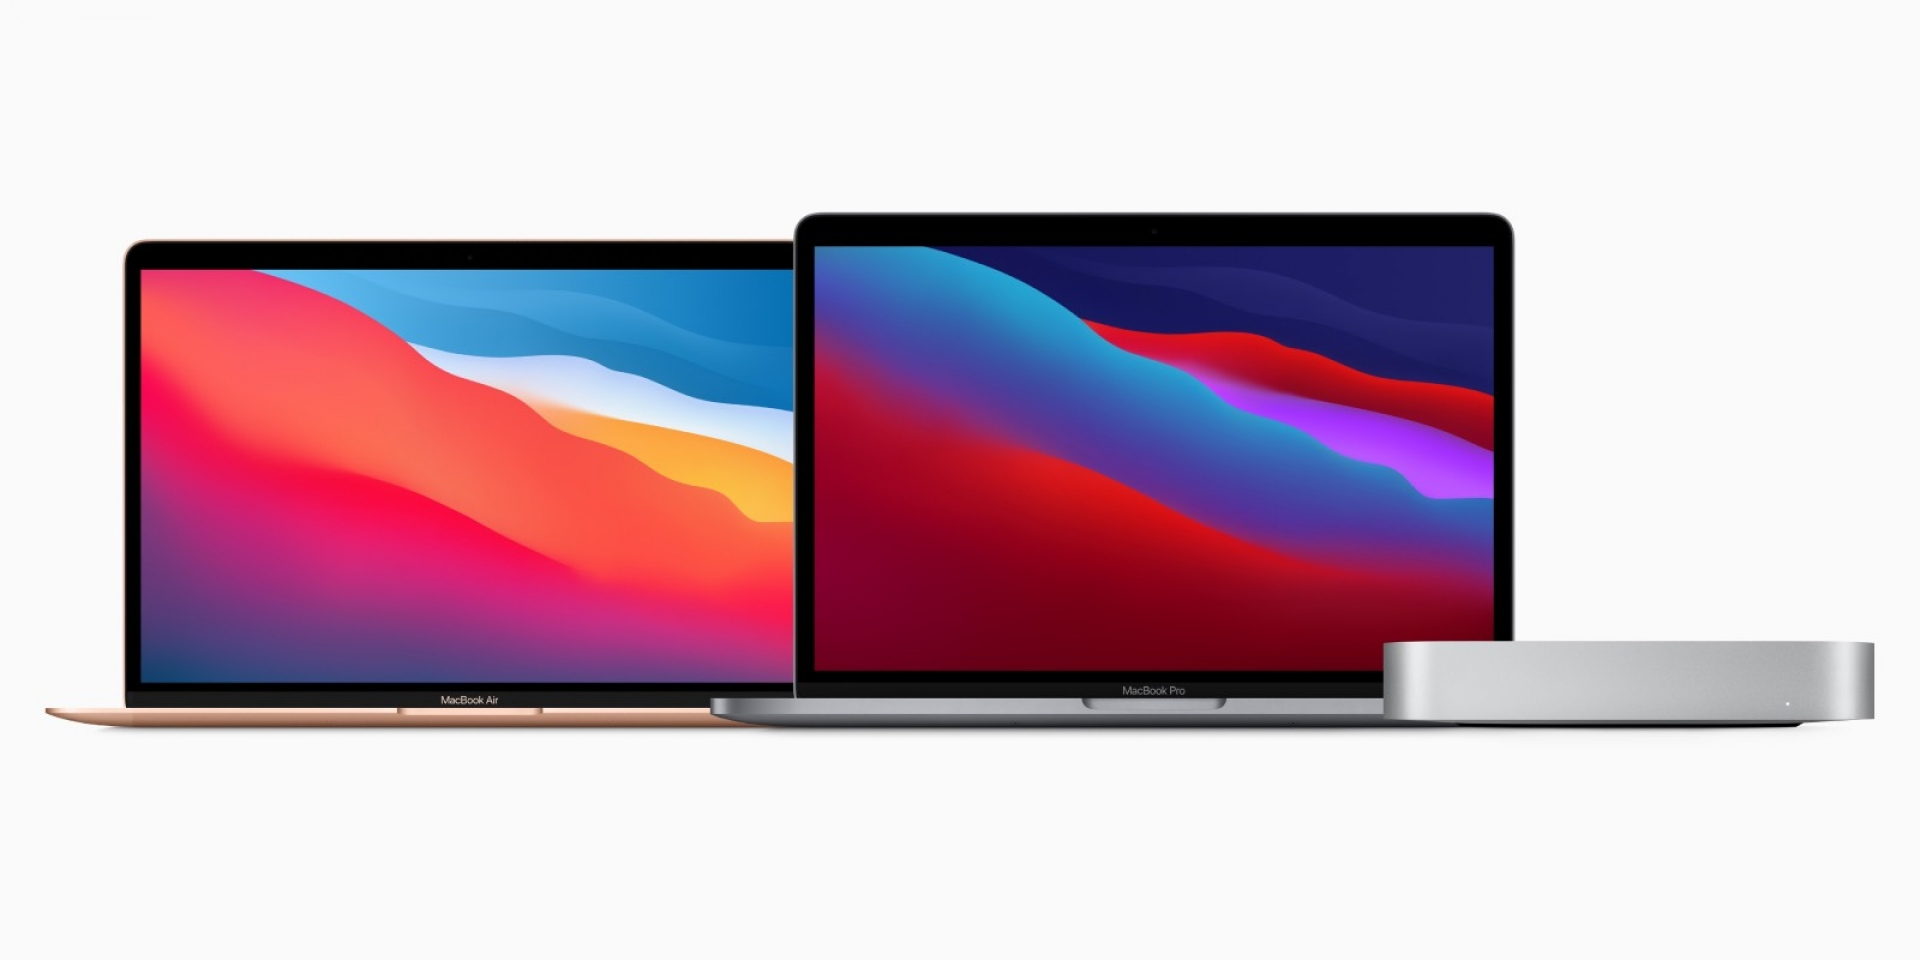 Apple自製晶片M1大軍來襲,三款Mac率先搭載